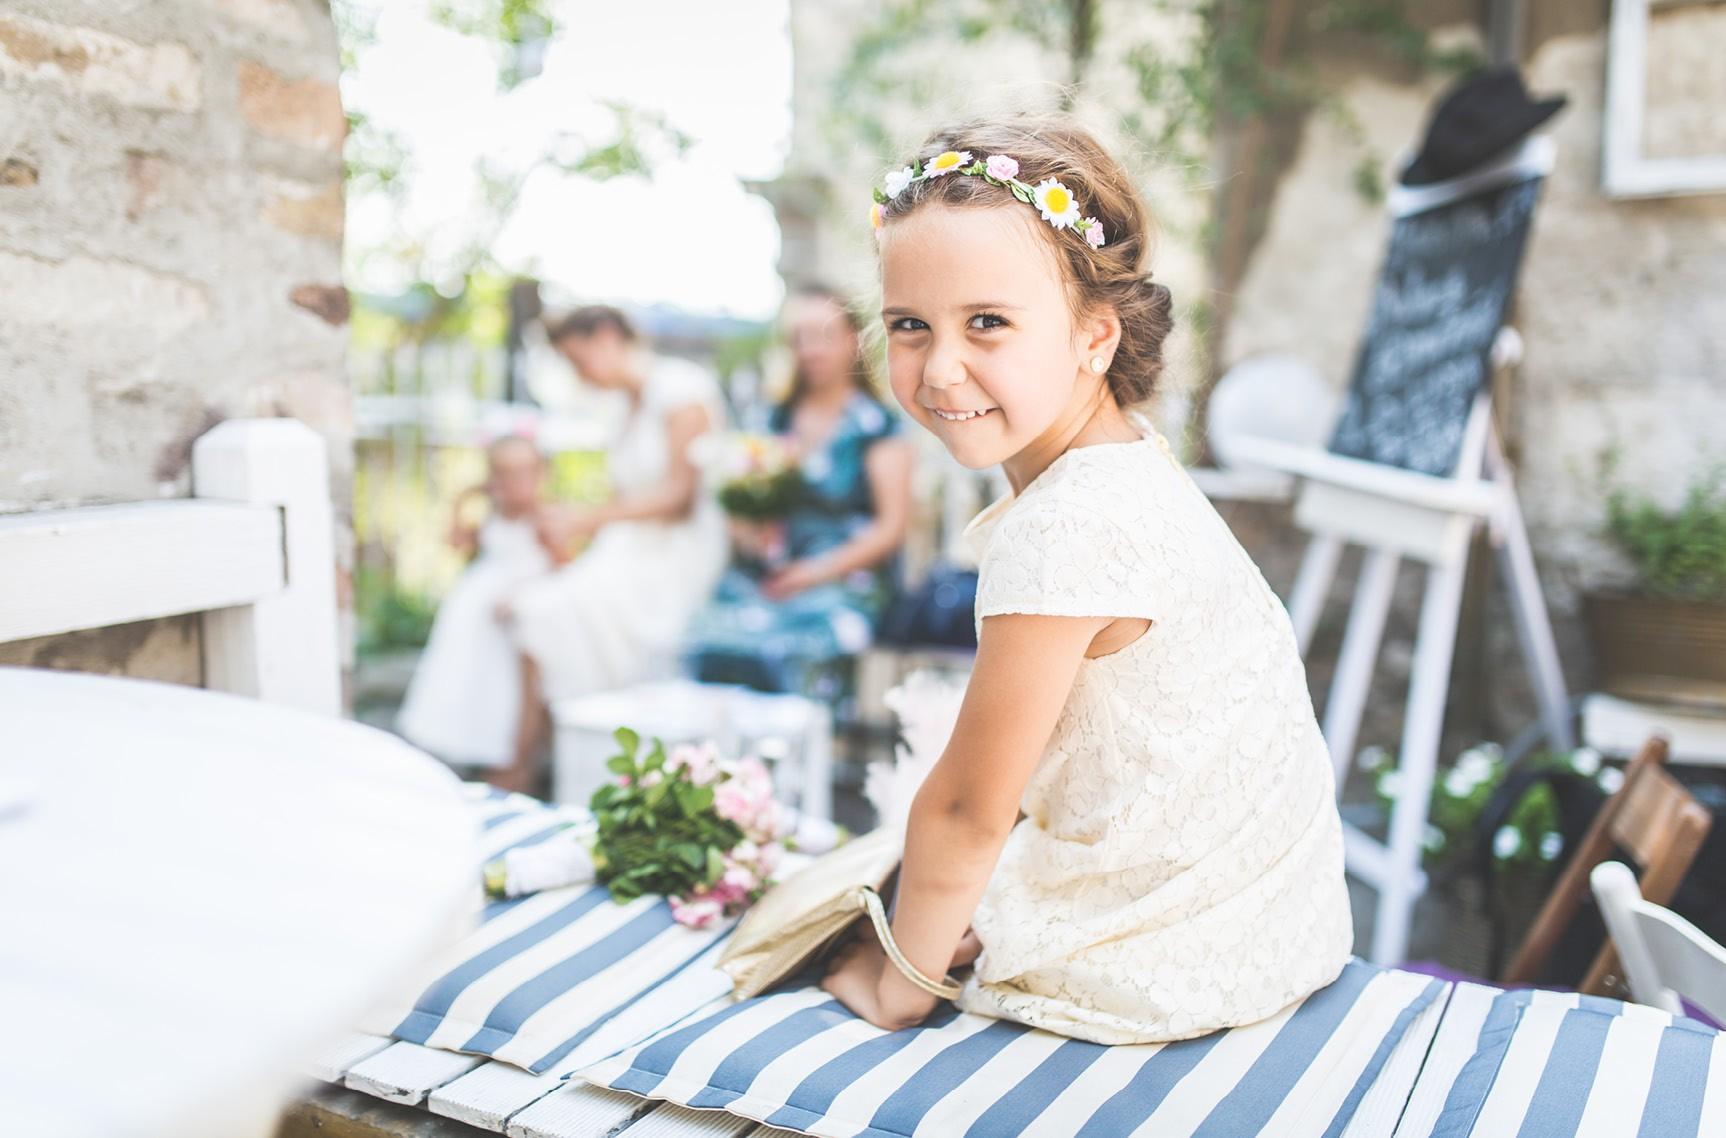 Bimbi in festa: look da cerimonia per i più piccoli!